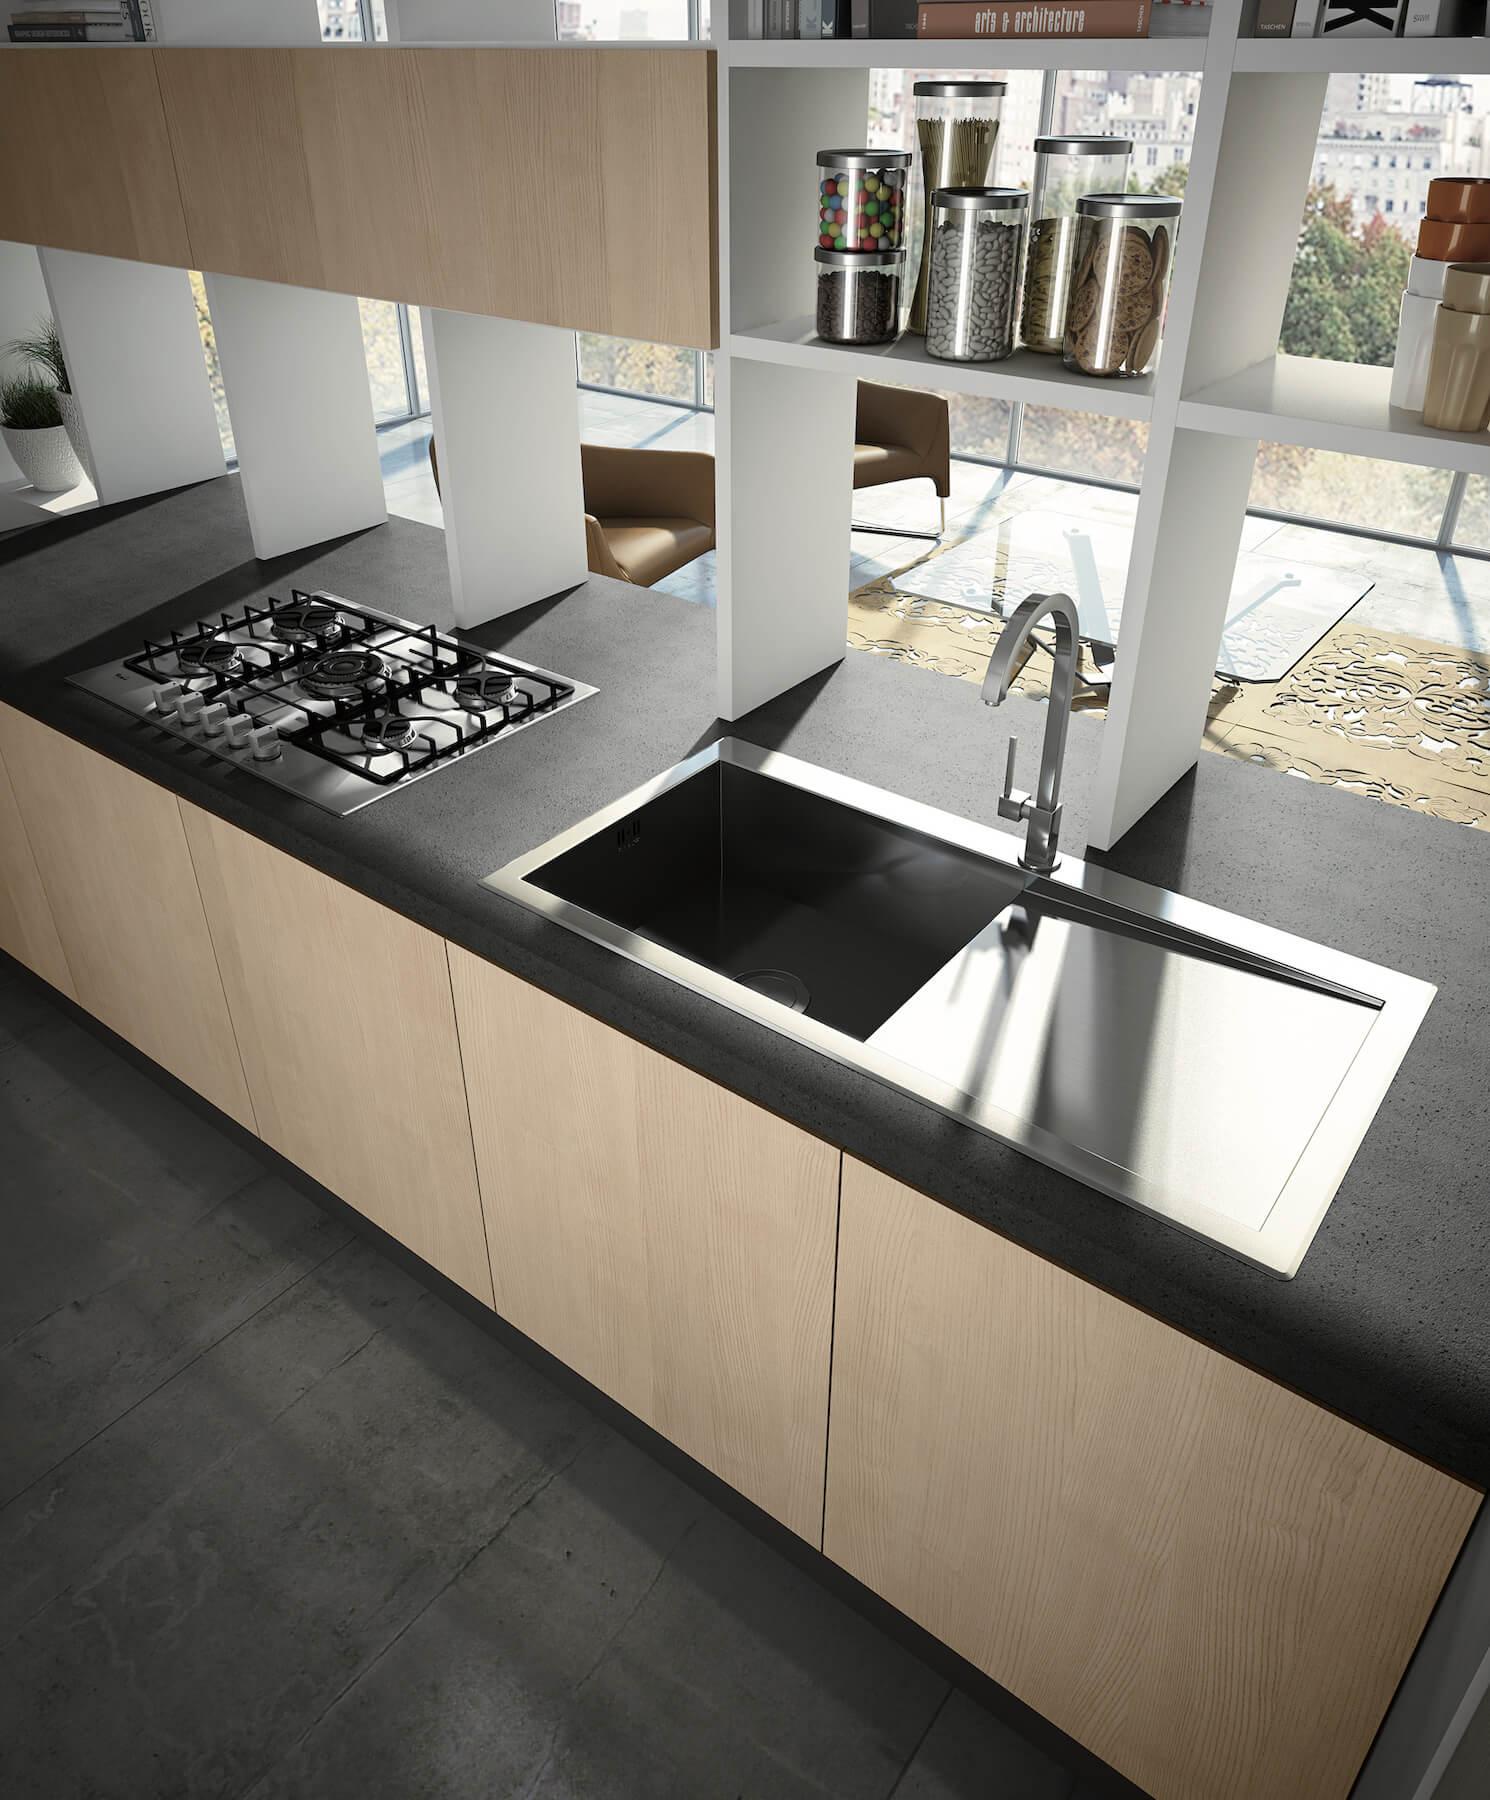 Full Size of Schwarze Spüle Küche Material Spüle Küche Spüle Küche Verstopft Spüle Küche Demontieren Küche Spüle Küche